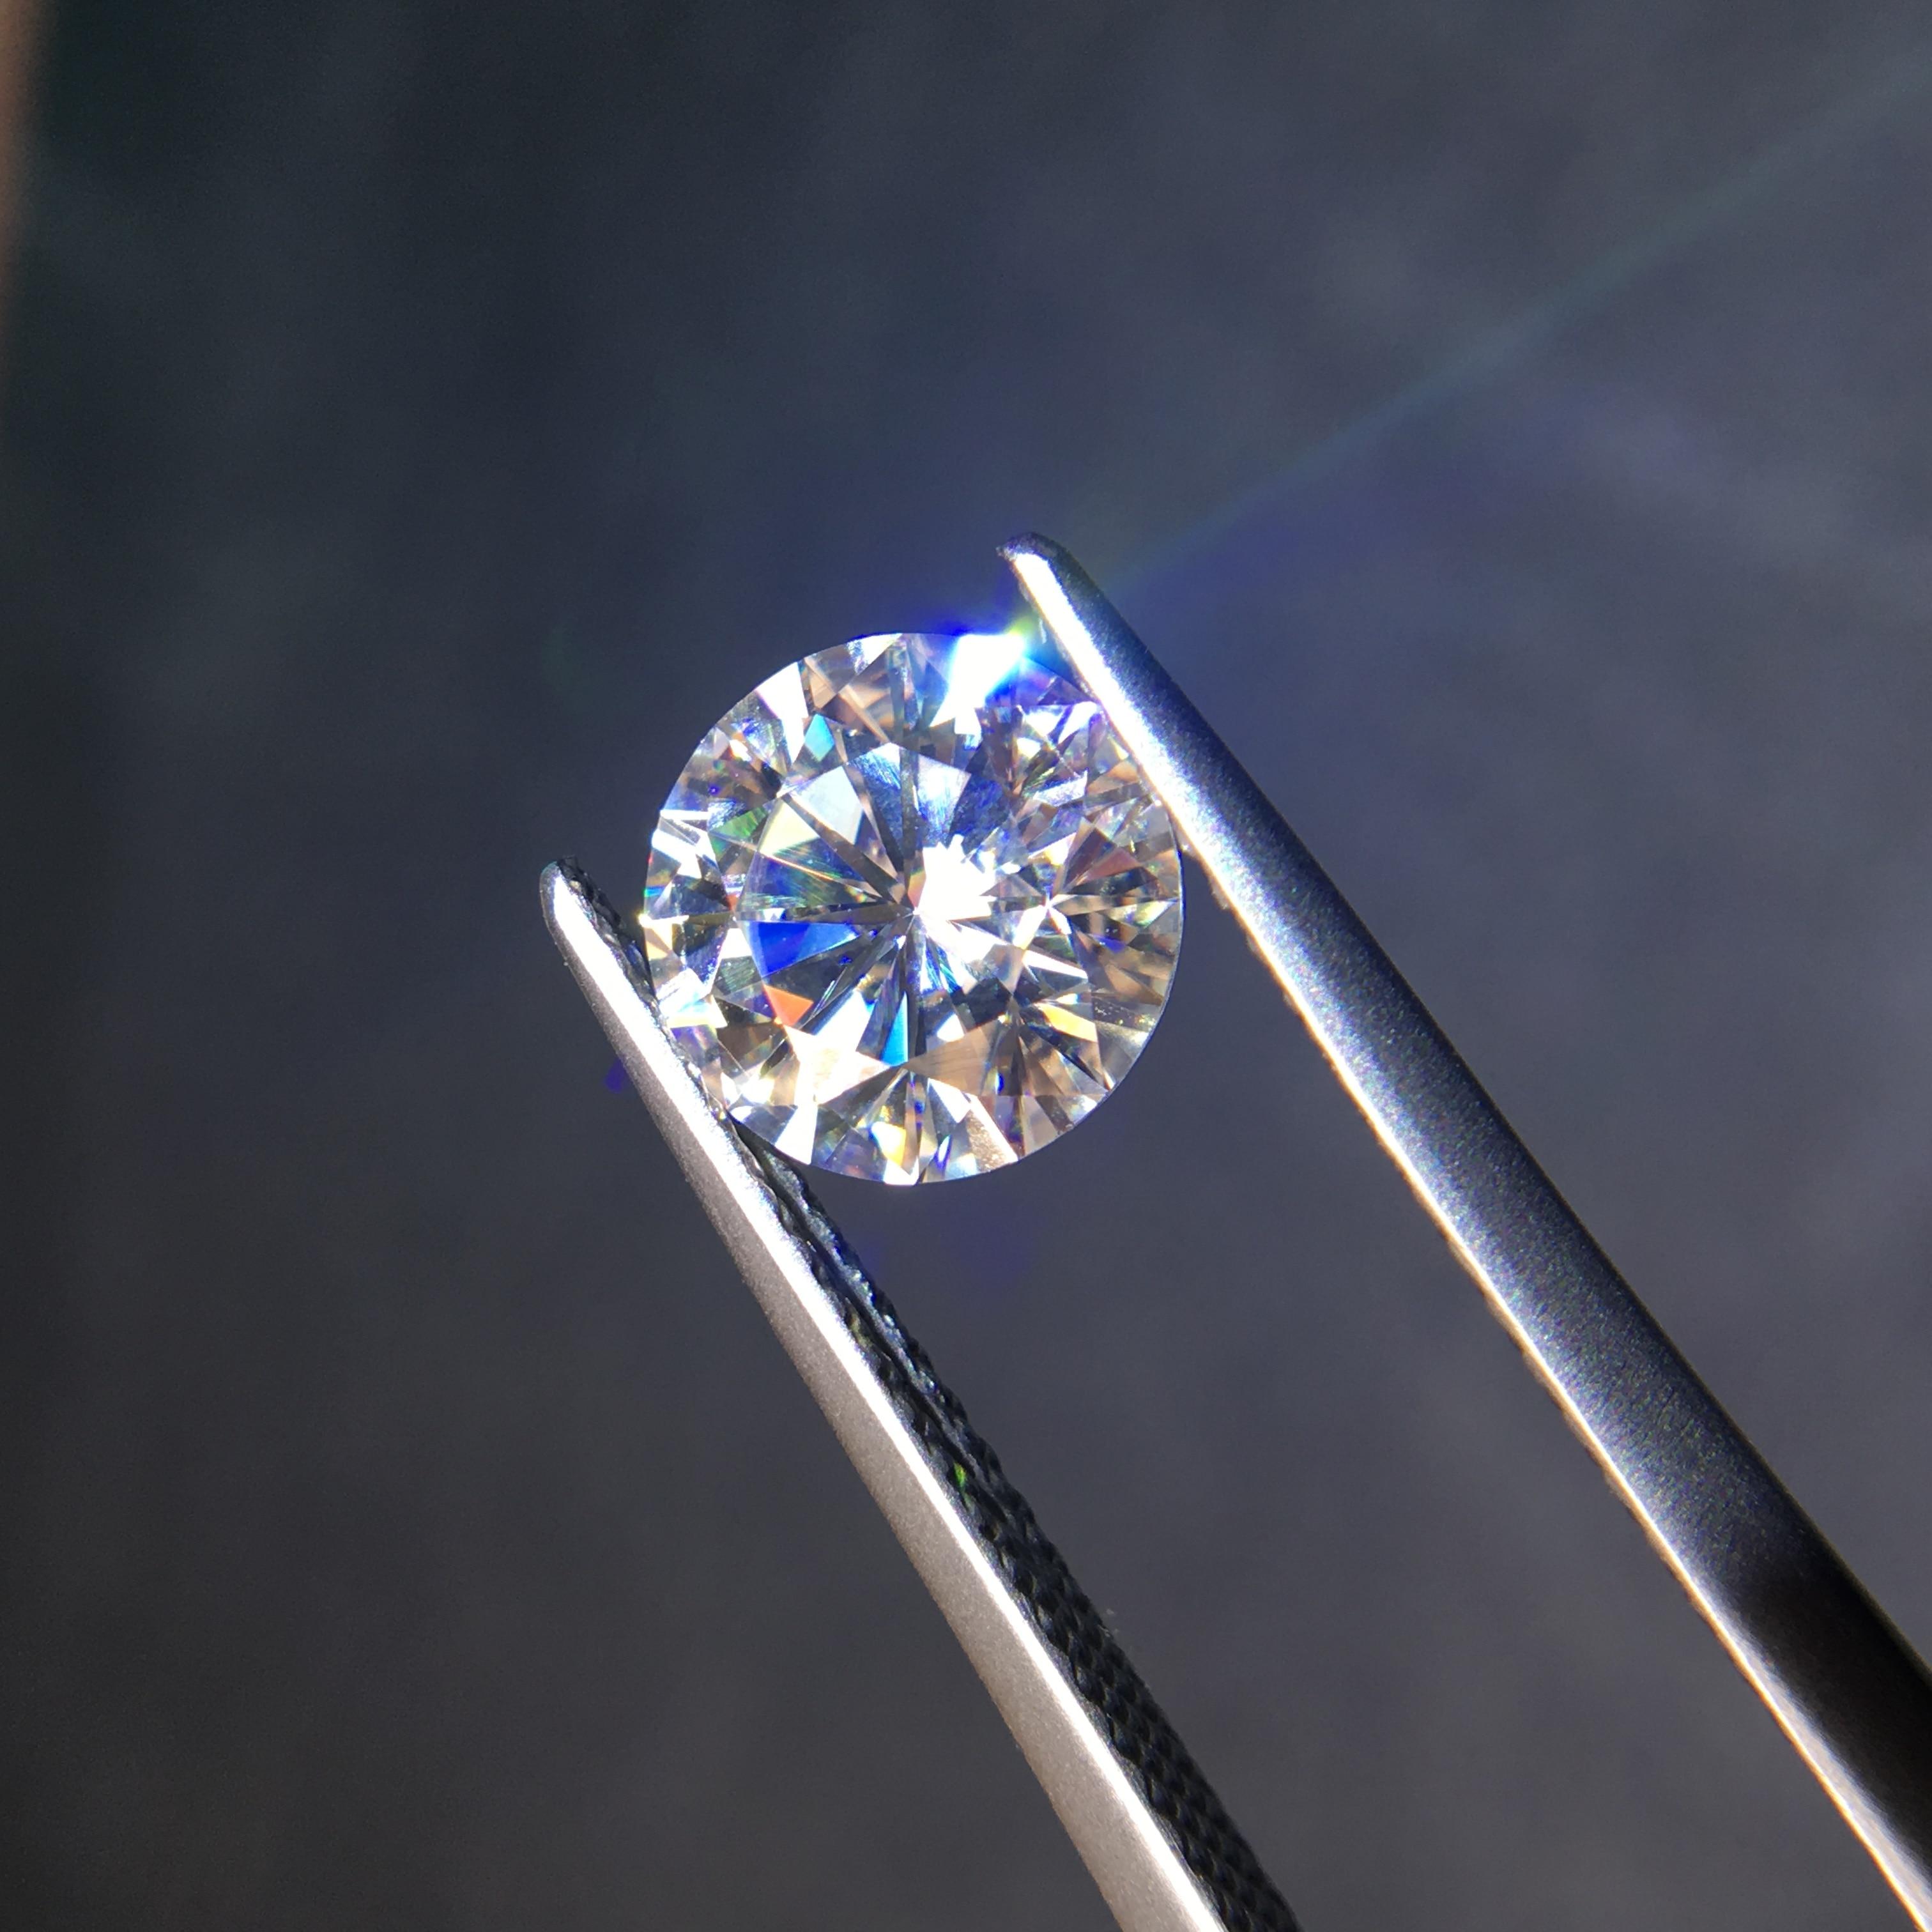 Runde Brillant Cut Moissanite 8mm GH Farbe 2ct Lose perlen Moissanite schmuck armband Ring DIY material Hohe qualität